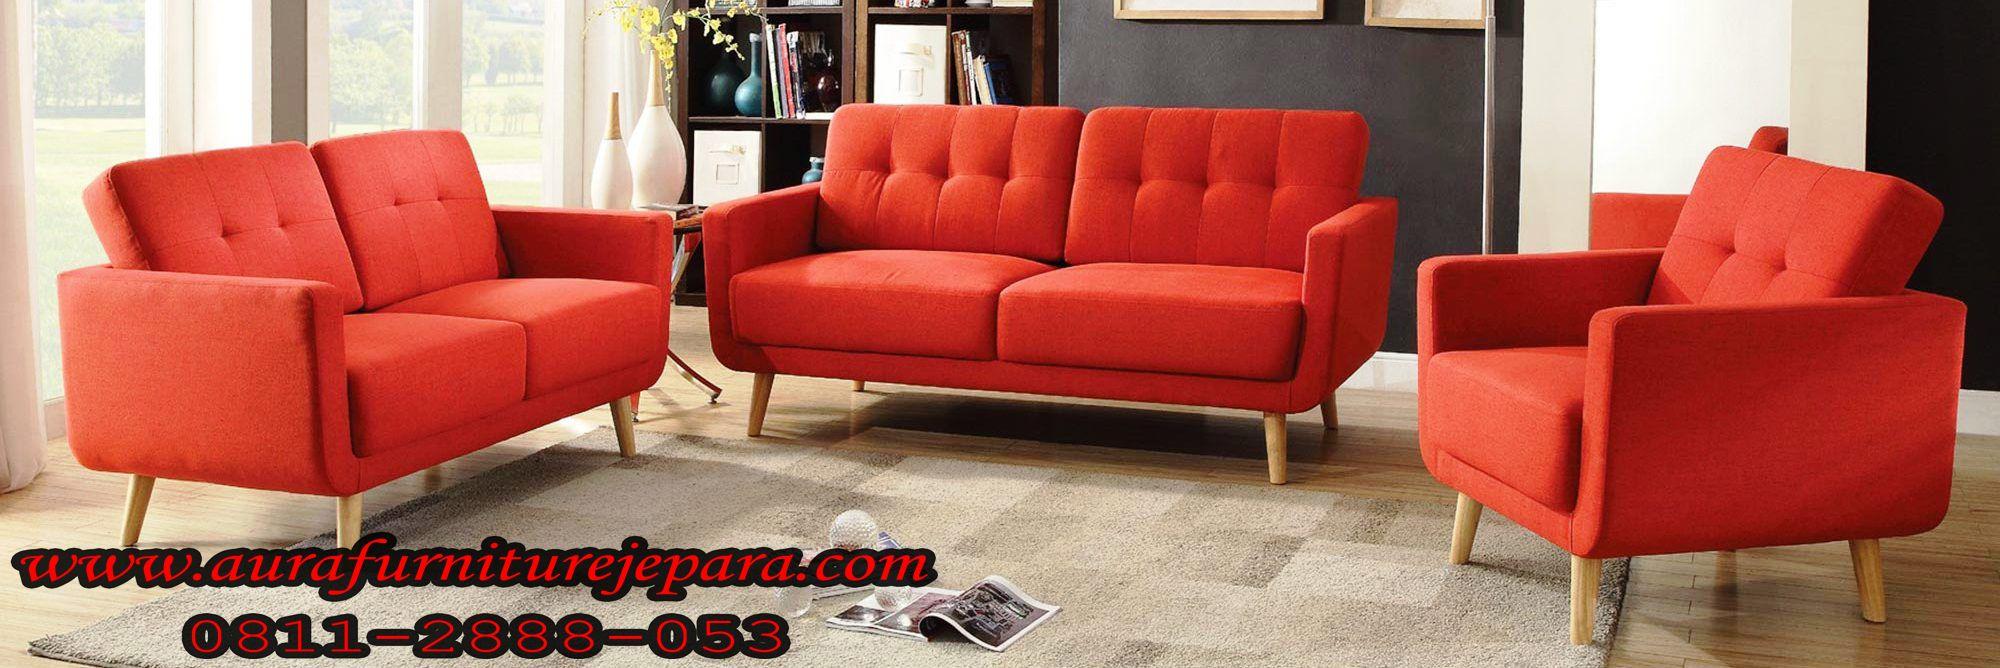 Sofa Retro Ruang Tamu Minimalis Modern Oranye Aura